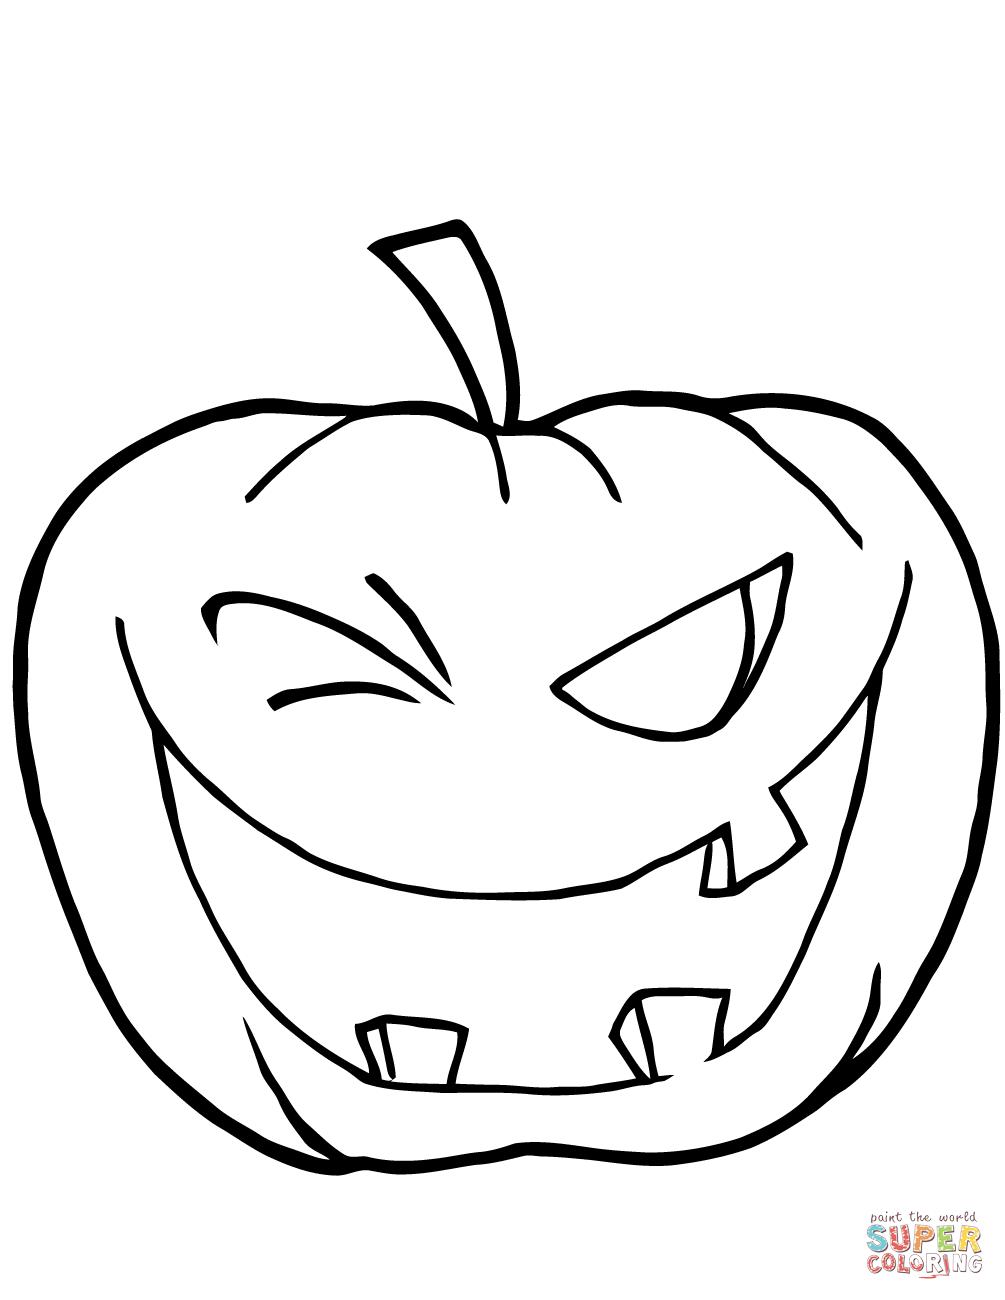 Pumpkin Patch Coloring Page Free Download Best Pumpkin